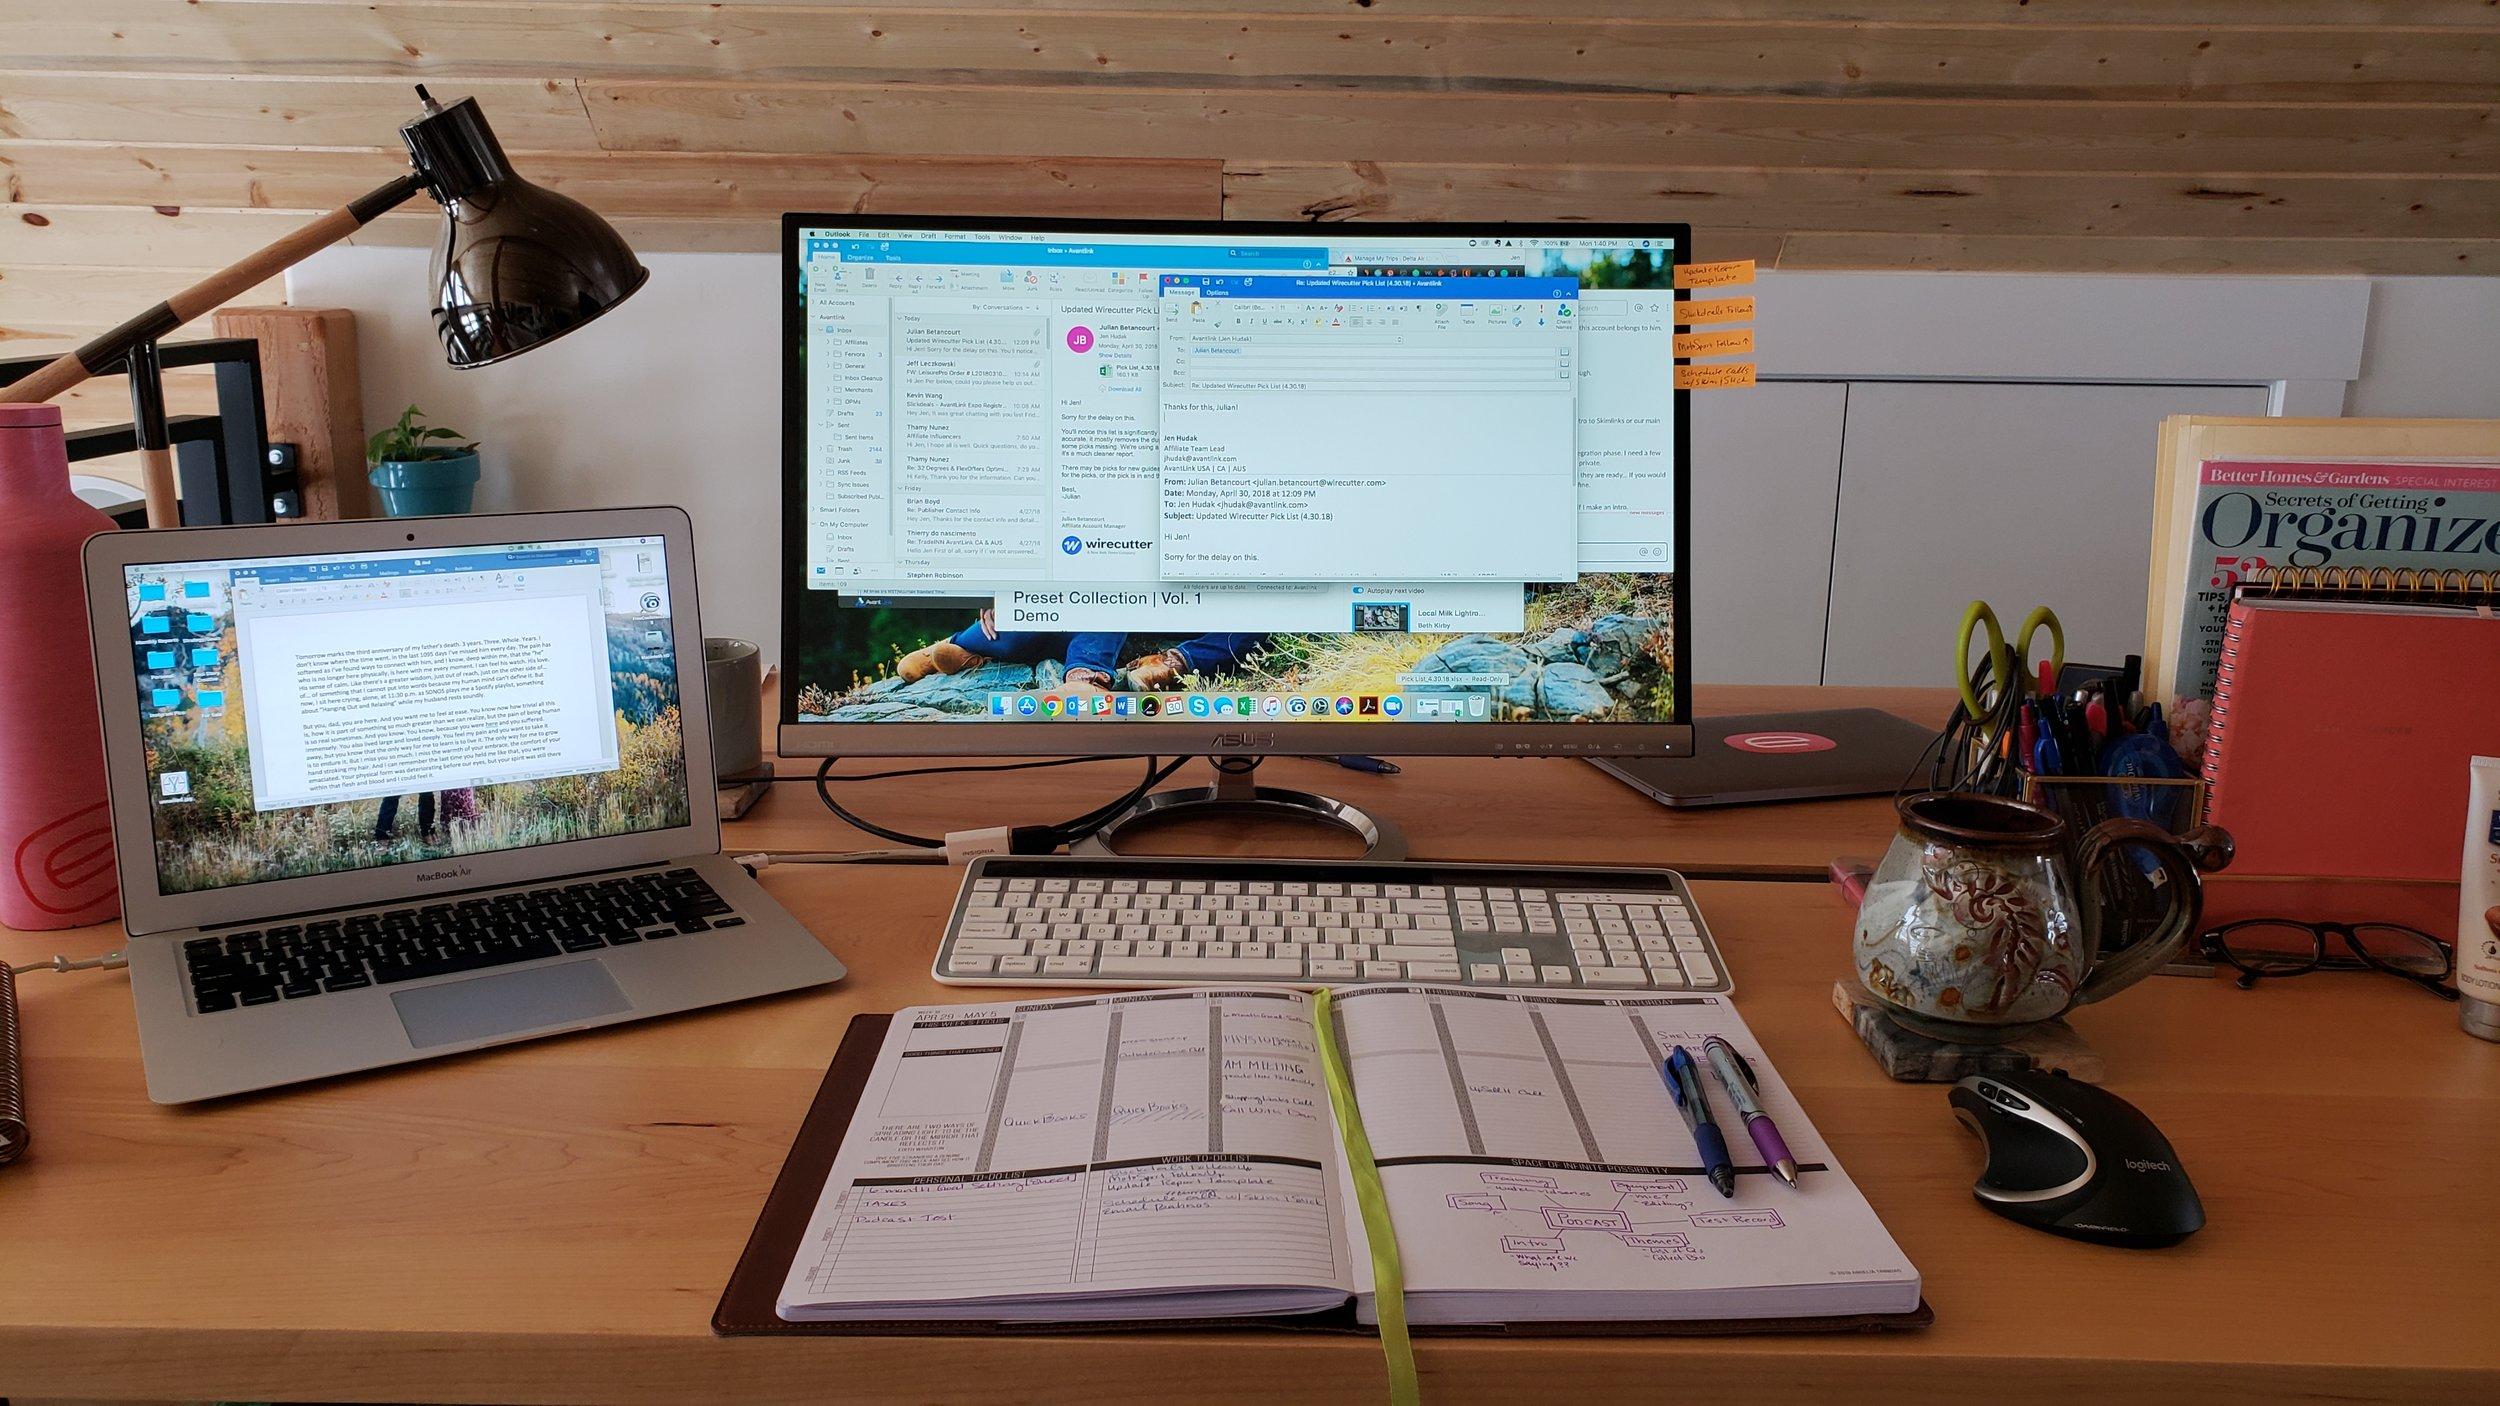 ergonomic workspace desk.jpg